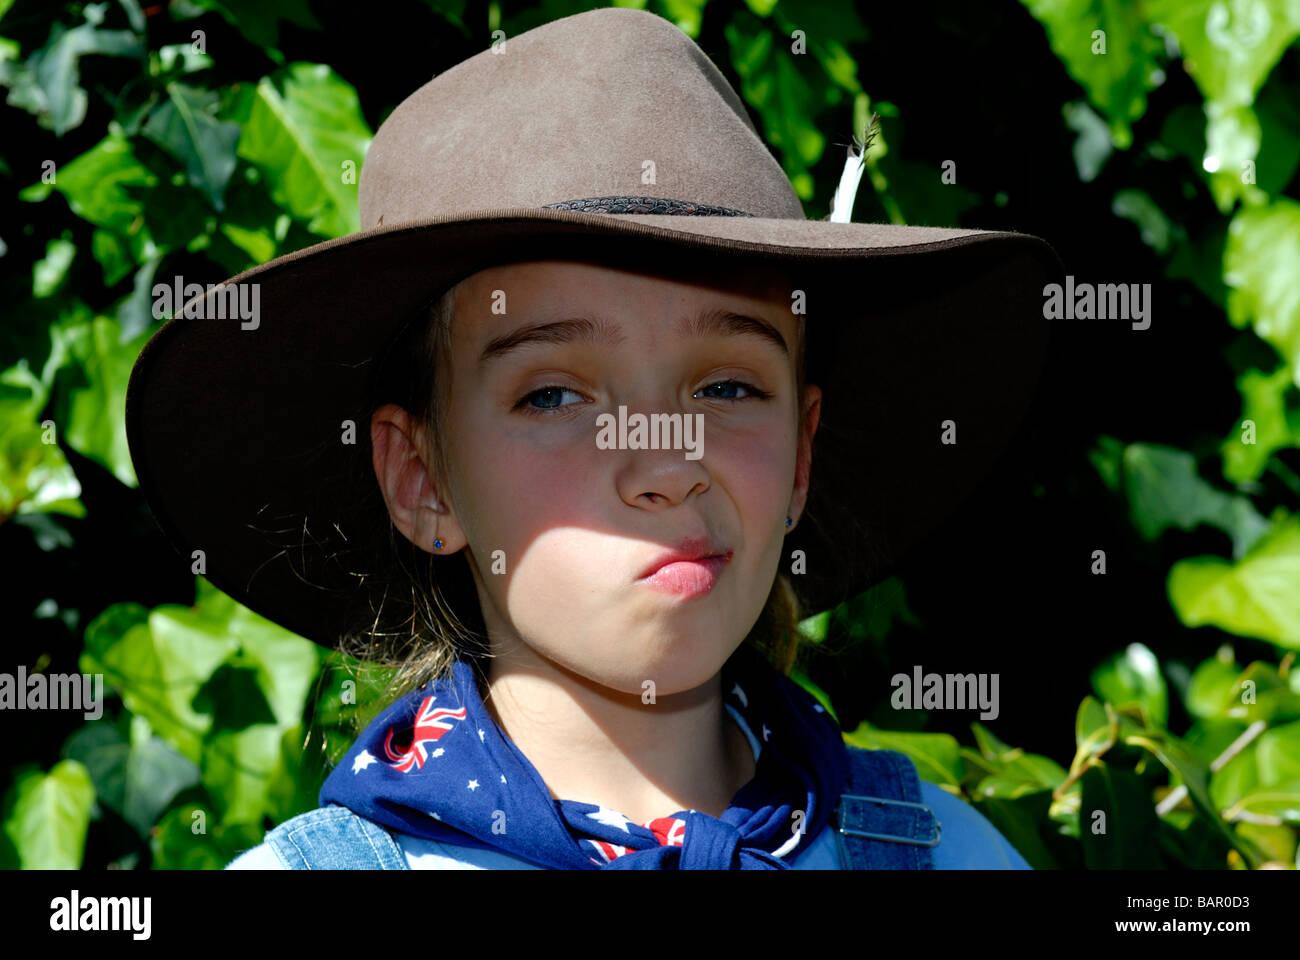 Bambino anni 10, indossando Episteme hat e indossando bandiera australiana bandana Immagini Stock